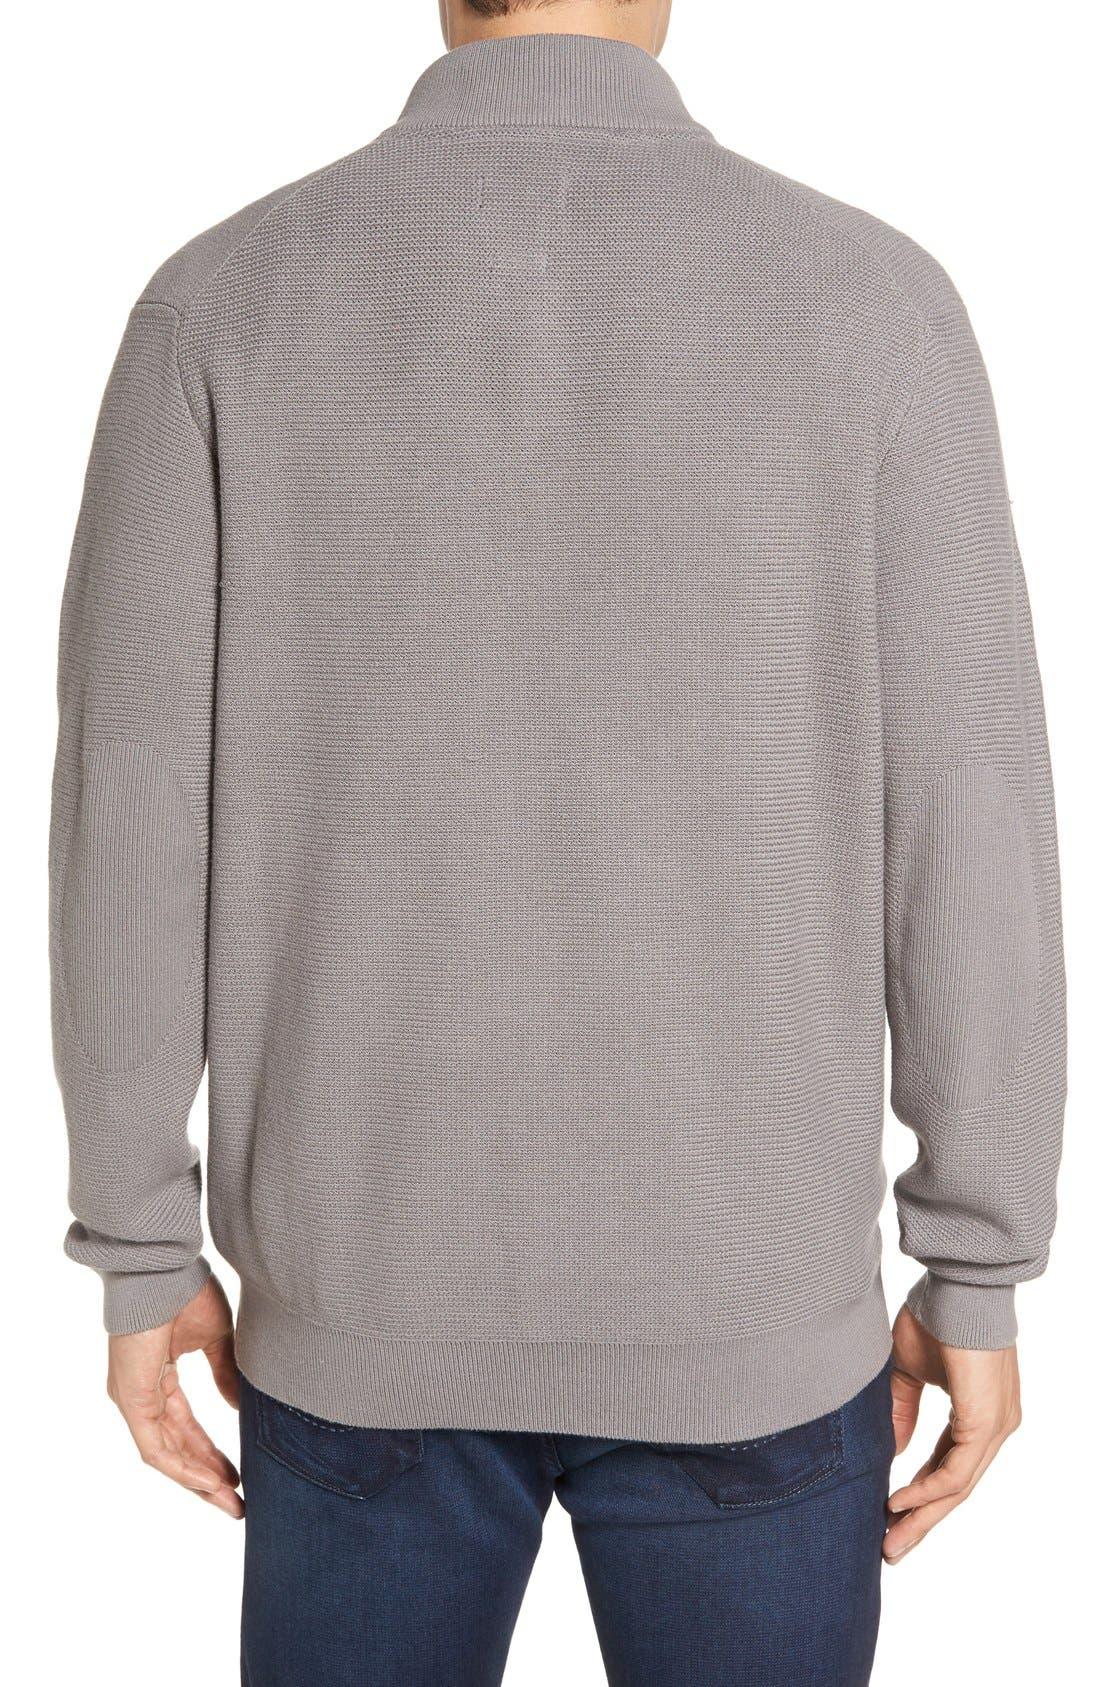 'Benson' Quarter Zip Textured Knit Sweater,                             Alternate thumbnail 14, color,